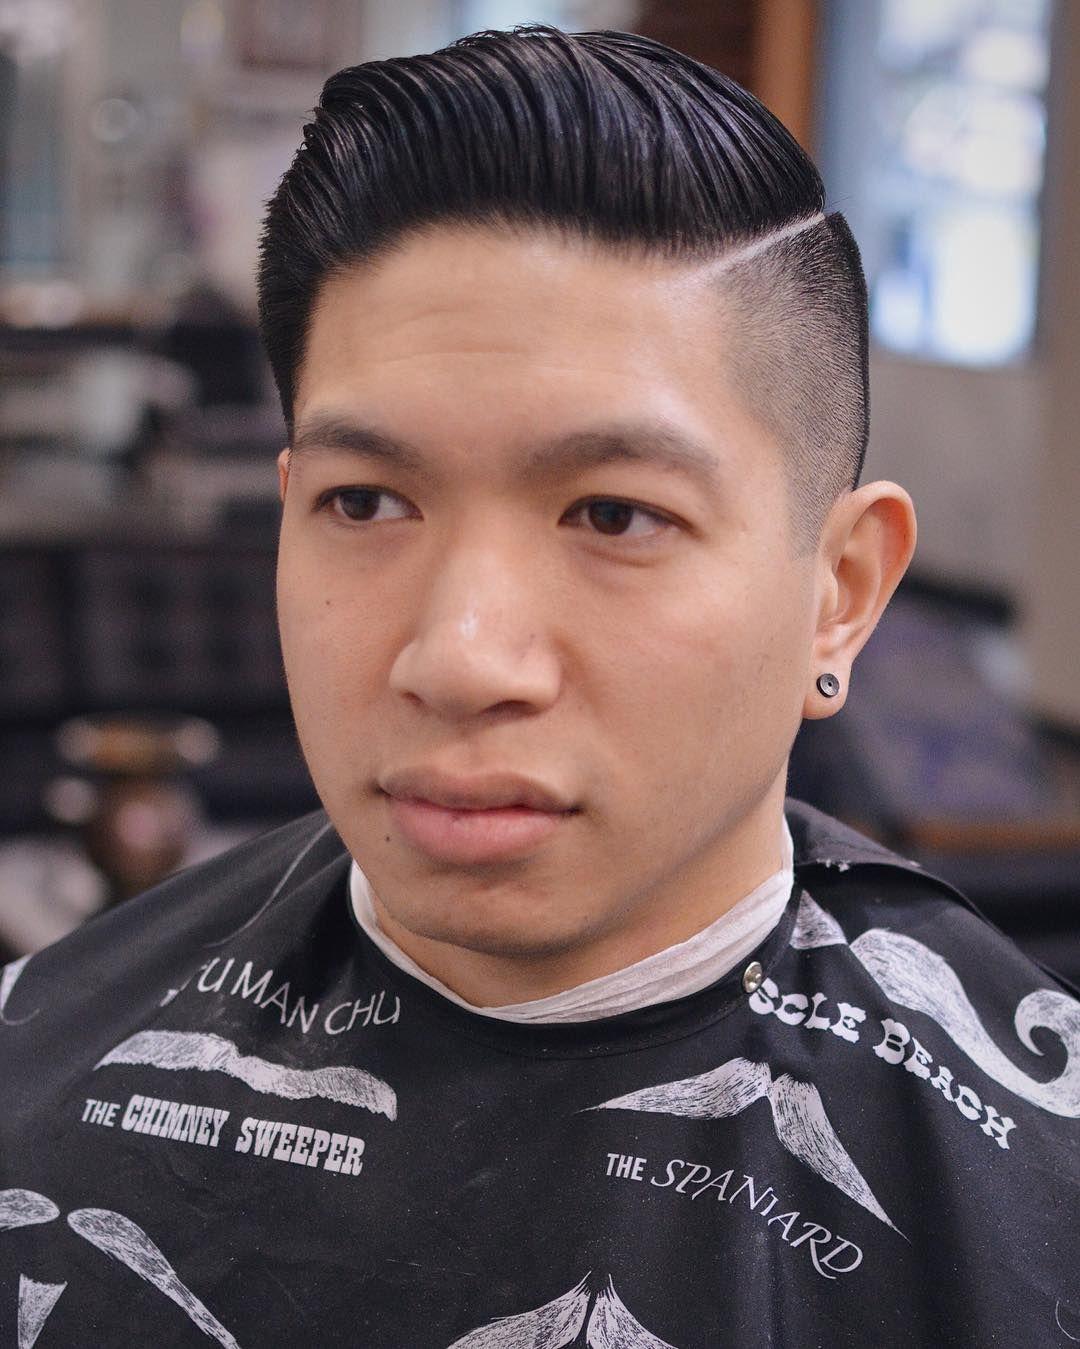 Mens fade haircuts haircut by blackfishbry ifttsxqxy menshair